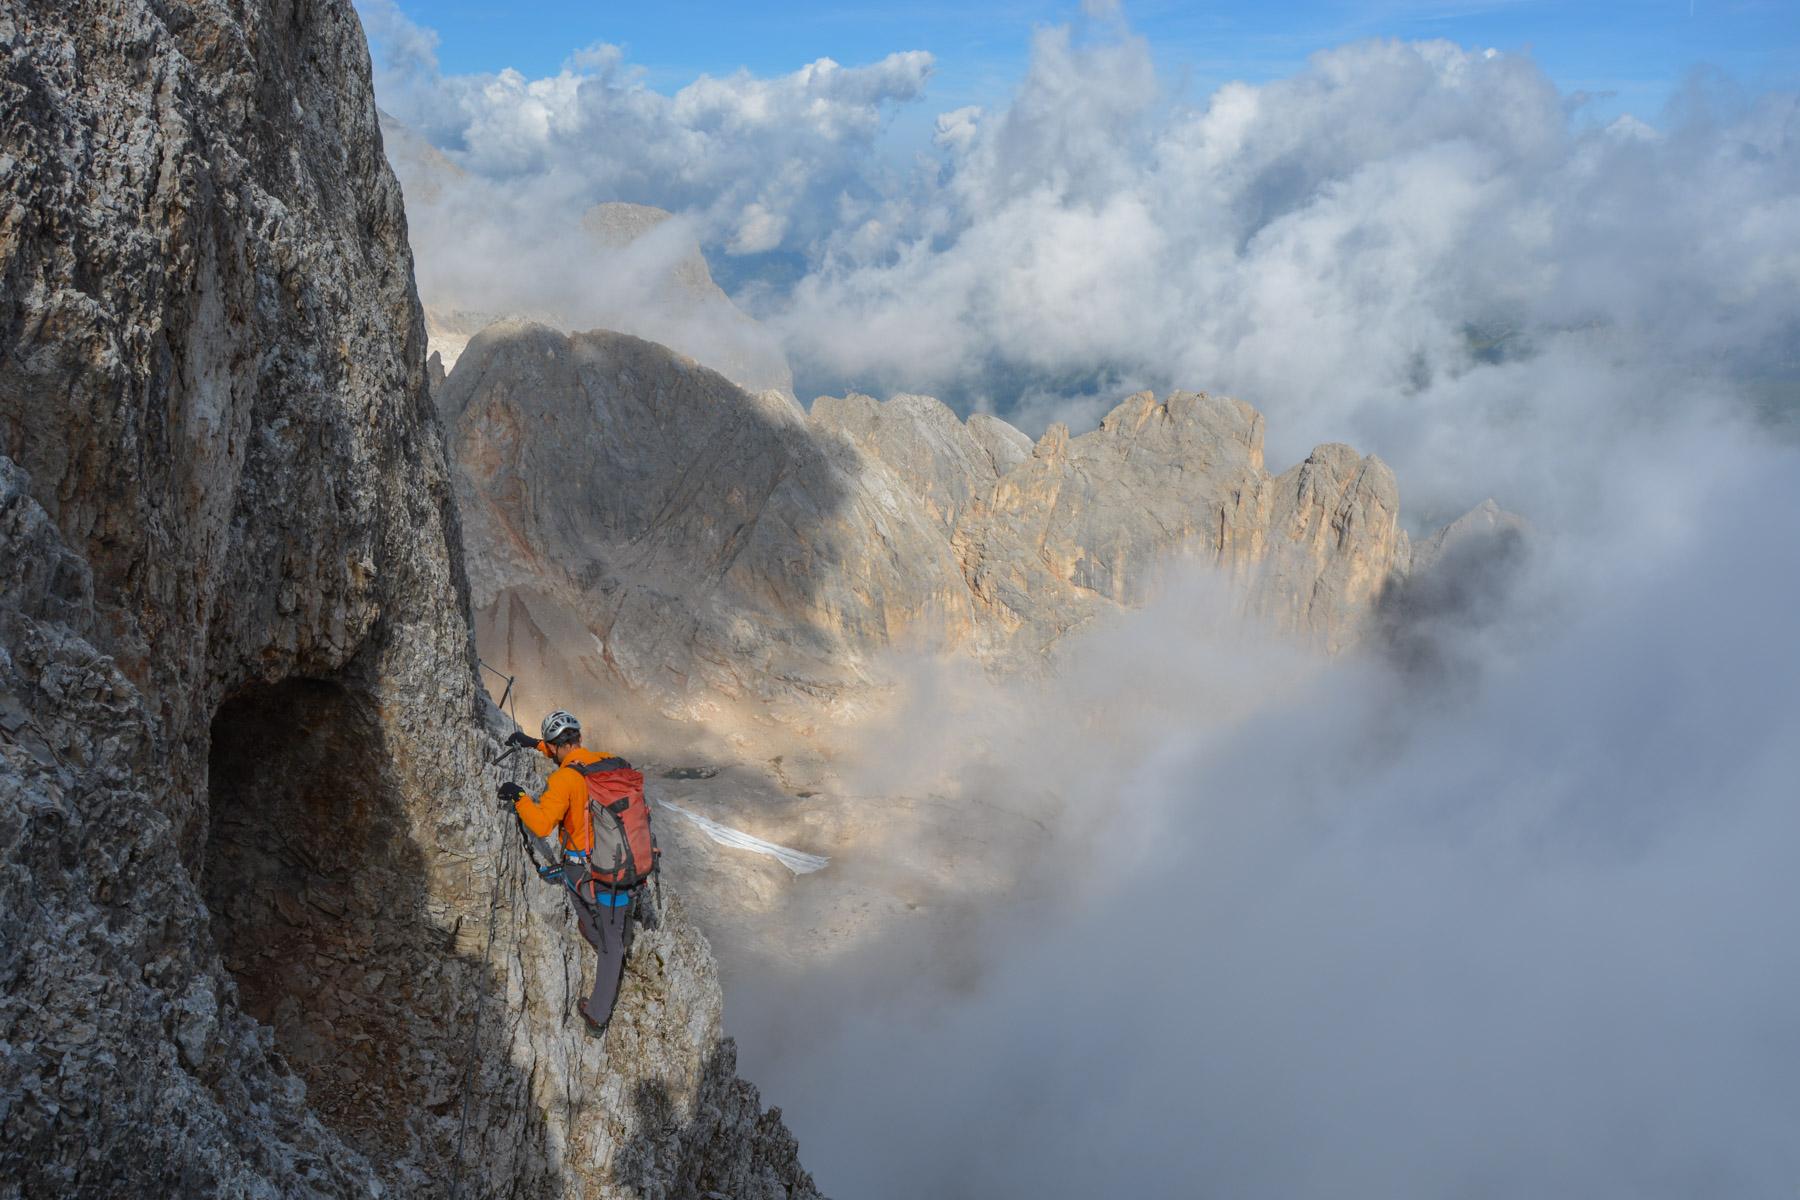 Via Eterna Brigata Cadore, Dolomites 1